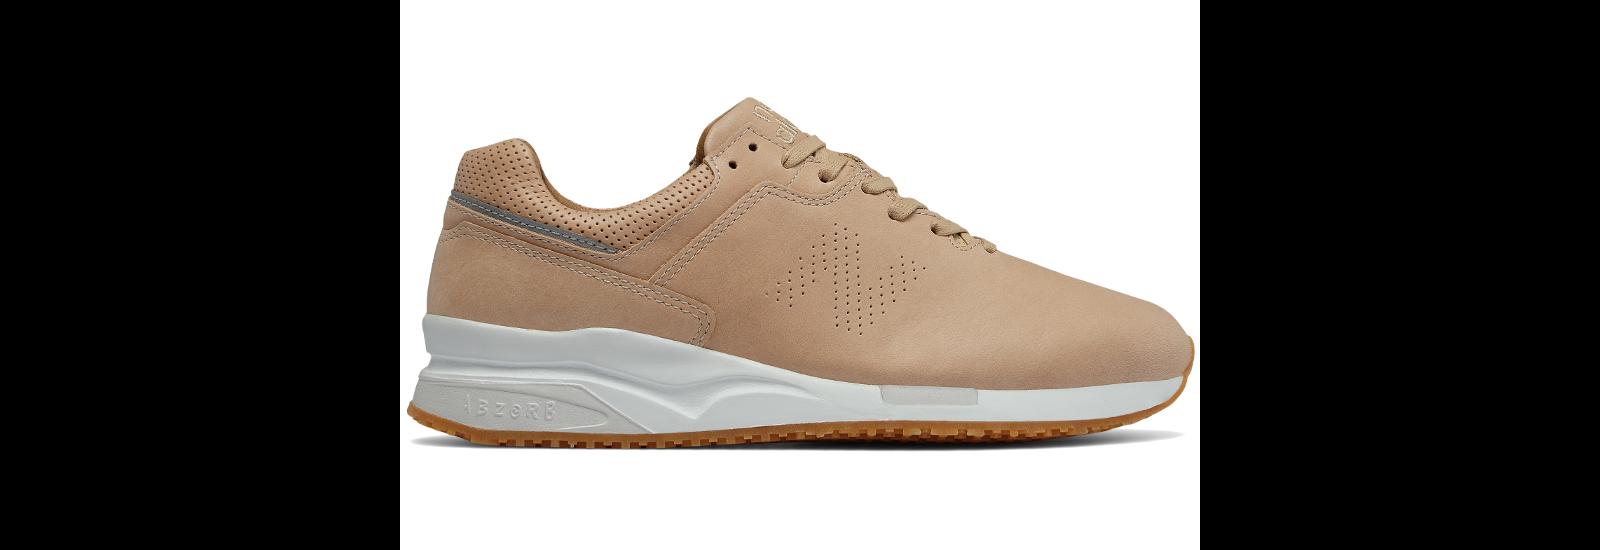 Nboutlet Pl New Balance Outlet Buty Odziez Oraz Akcesoria Do Biegania New Balance Shoes Sneakers